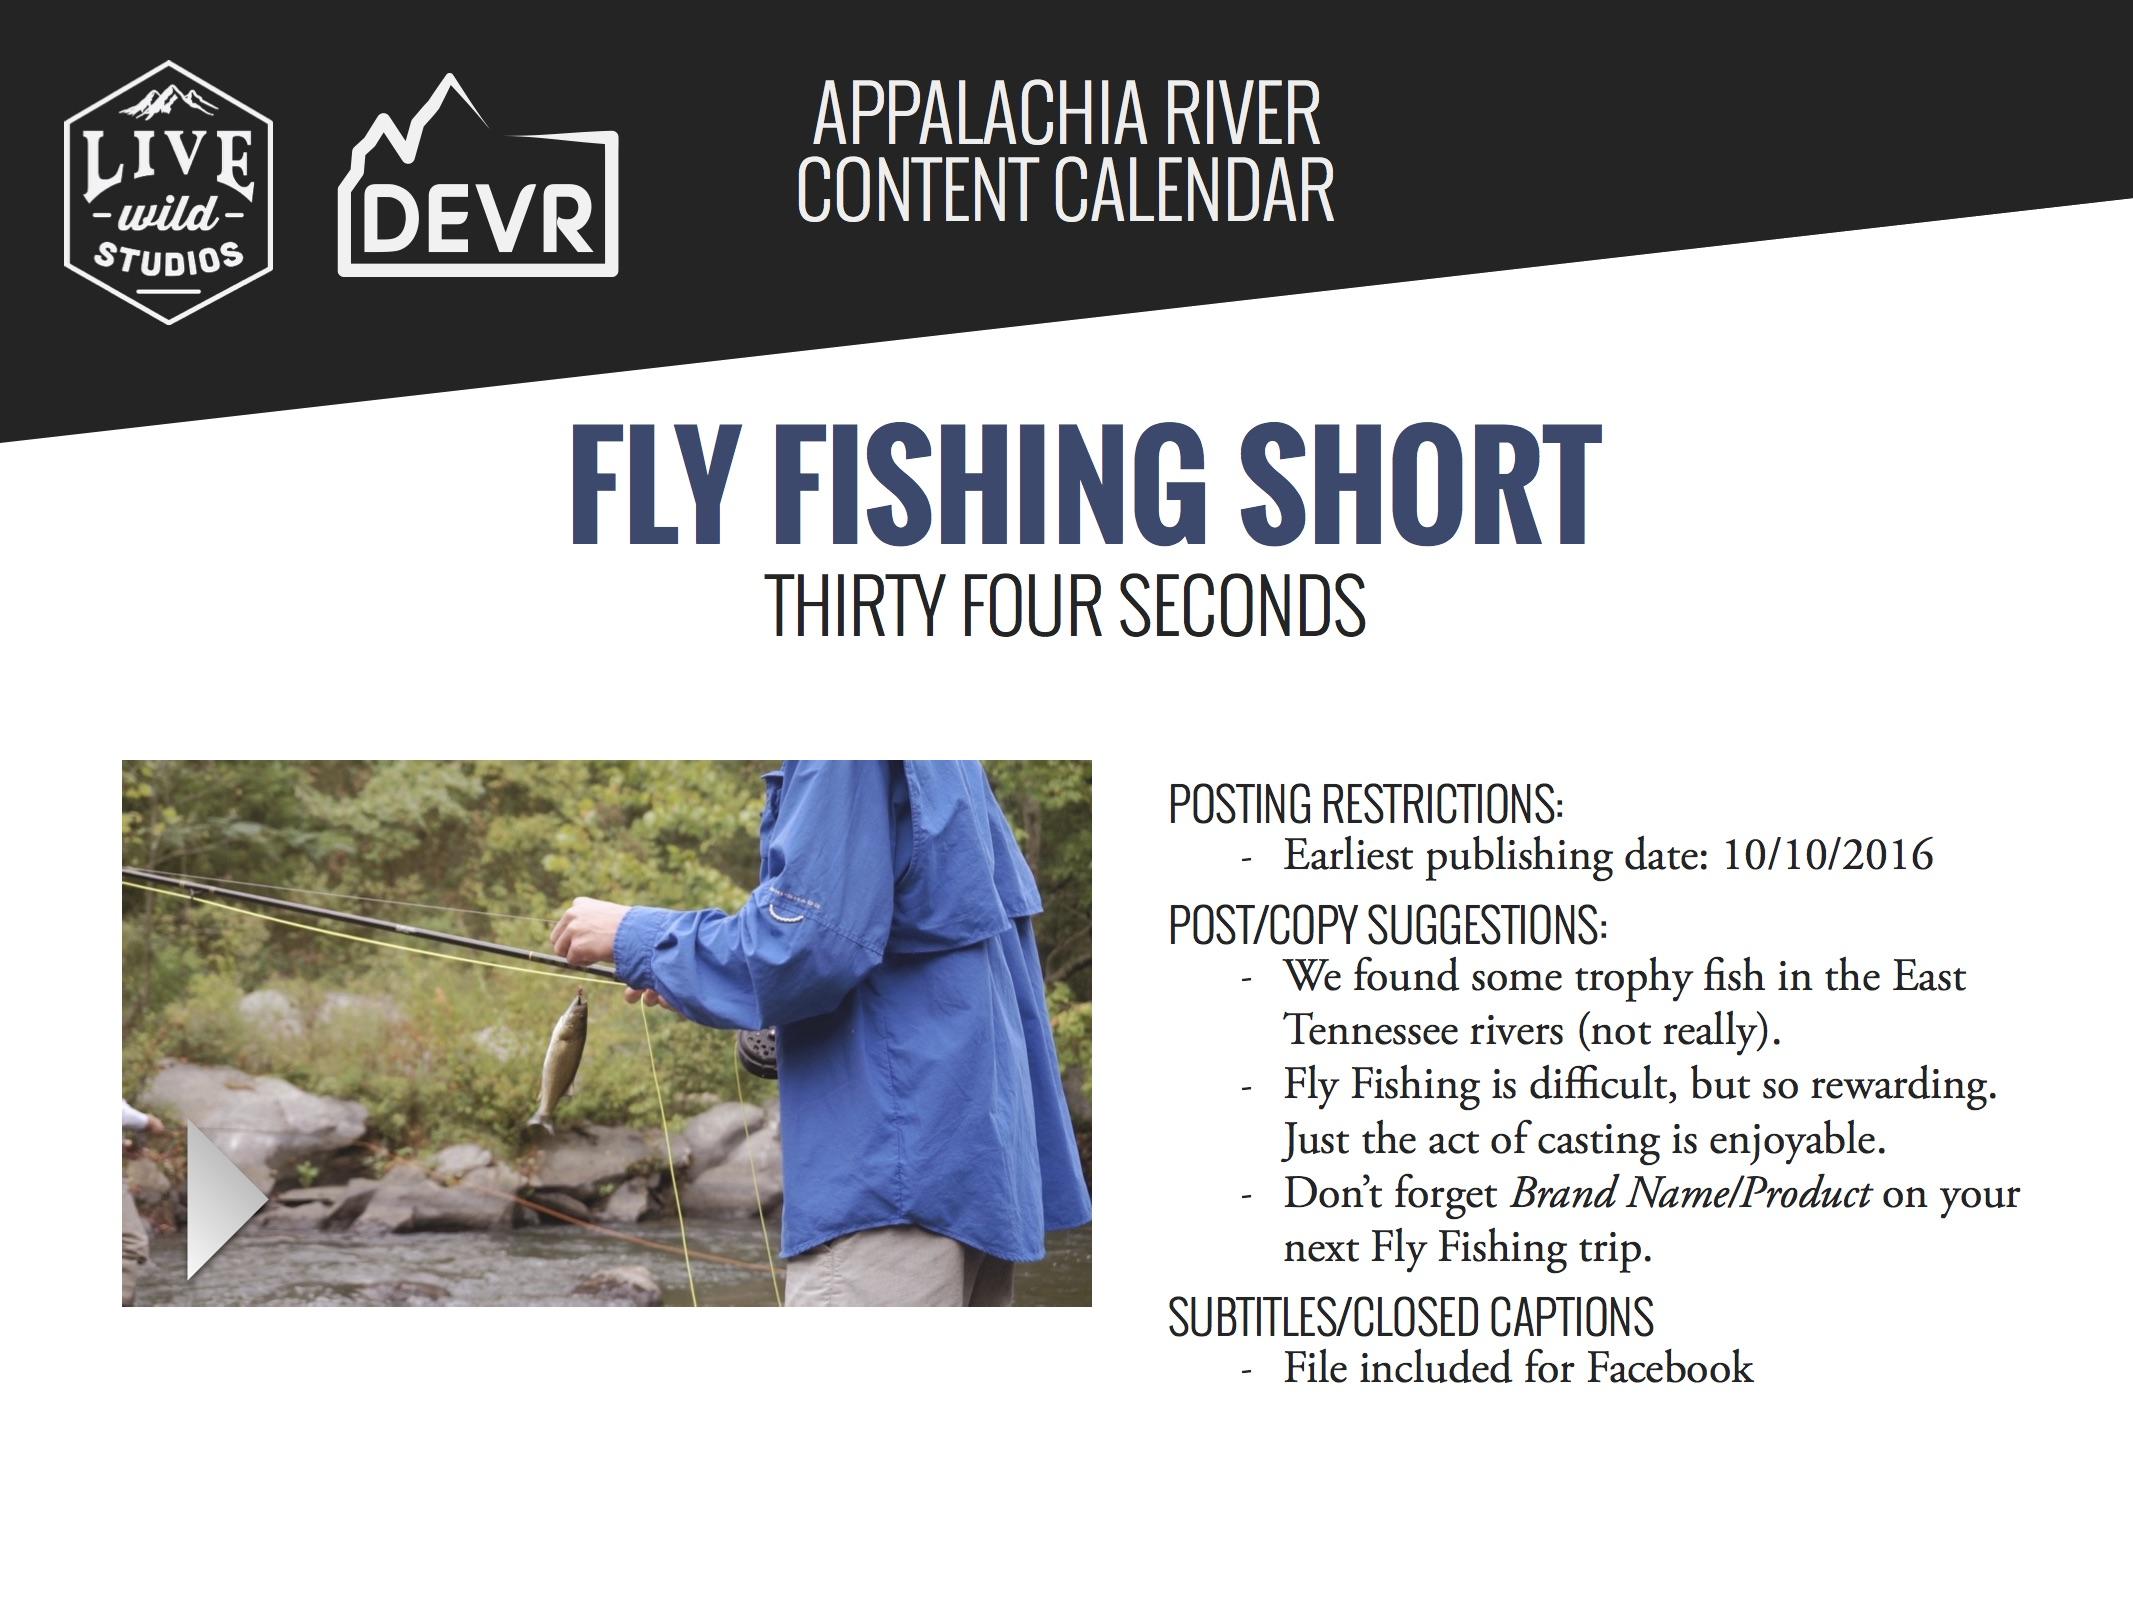 Appalachia River Adventure 2016 Campaign Guide 8.jpg